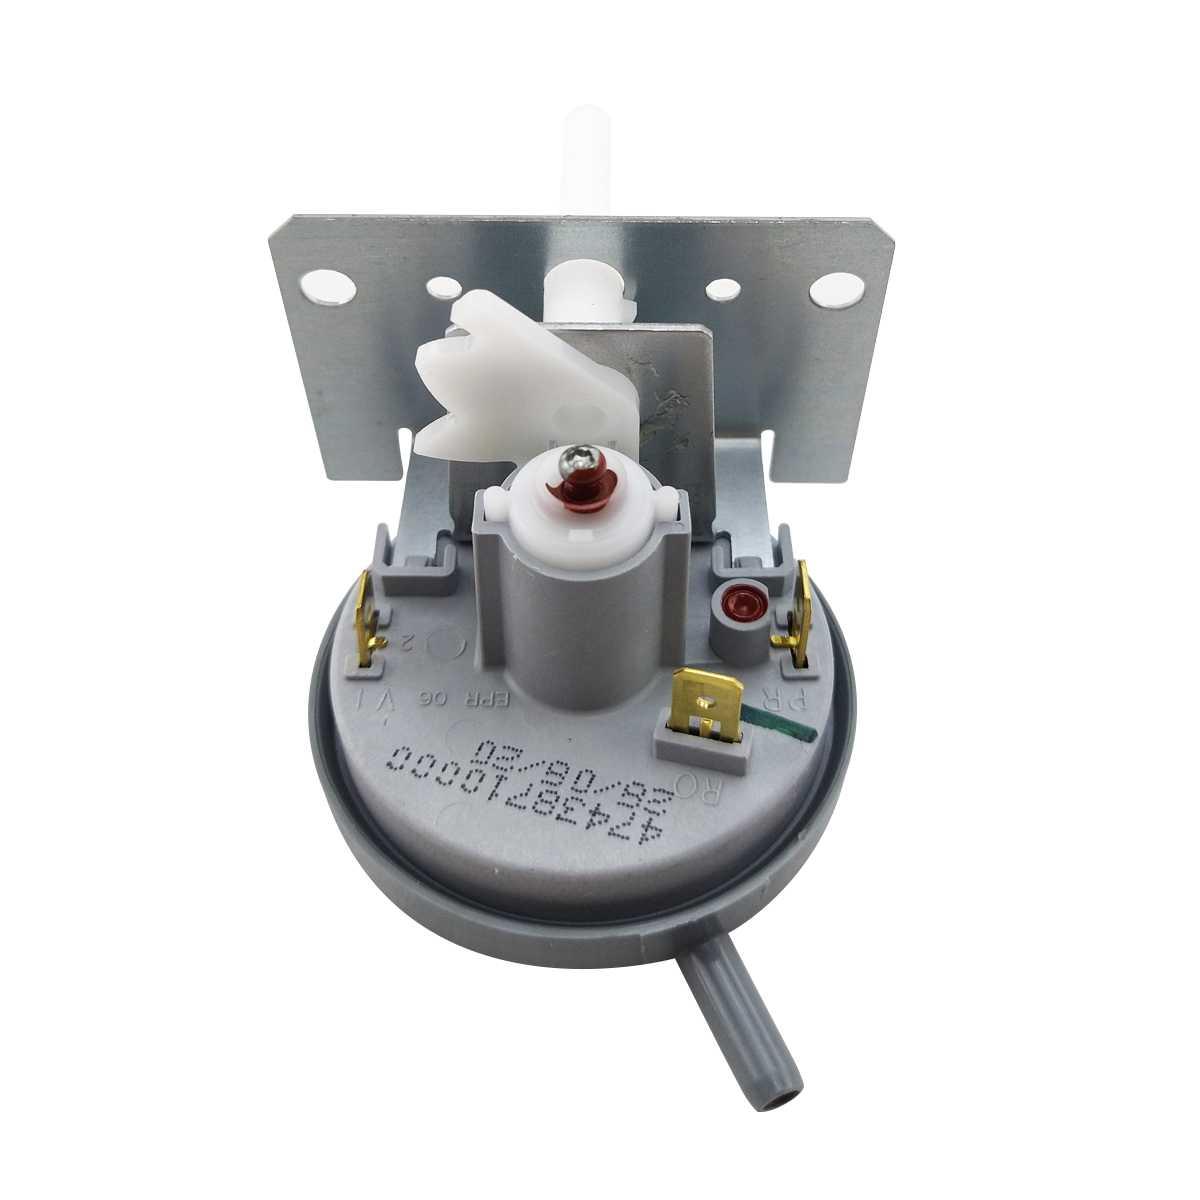 Pressostato do Nivel de água 4 niveis  para lavadora Electrolux